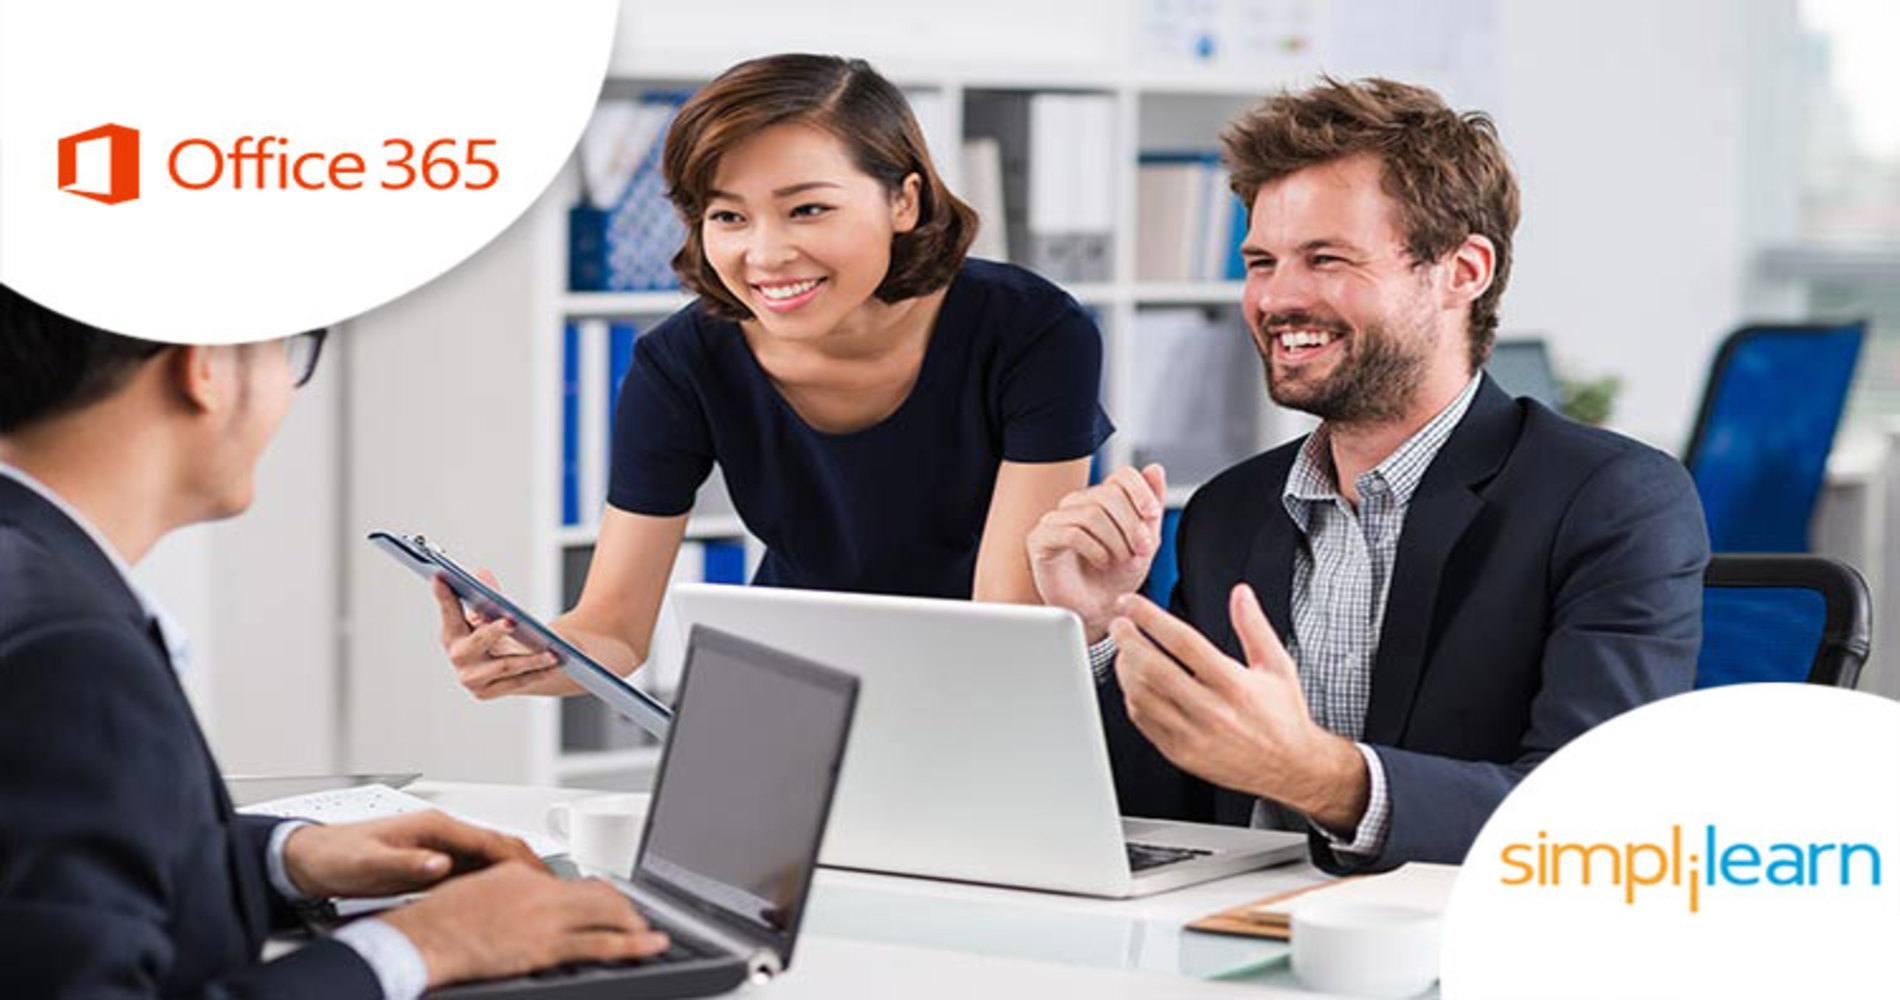 Quickstart Office 365-background image